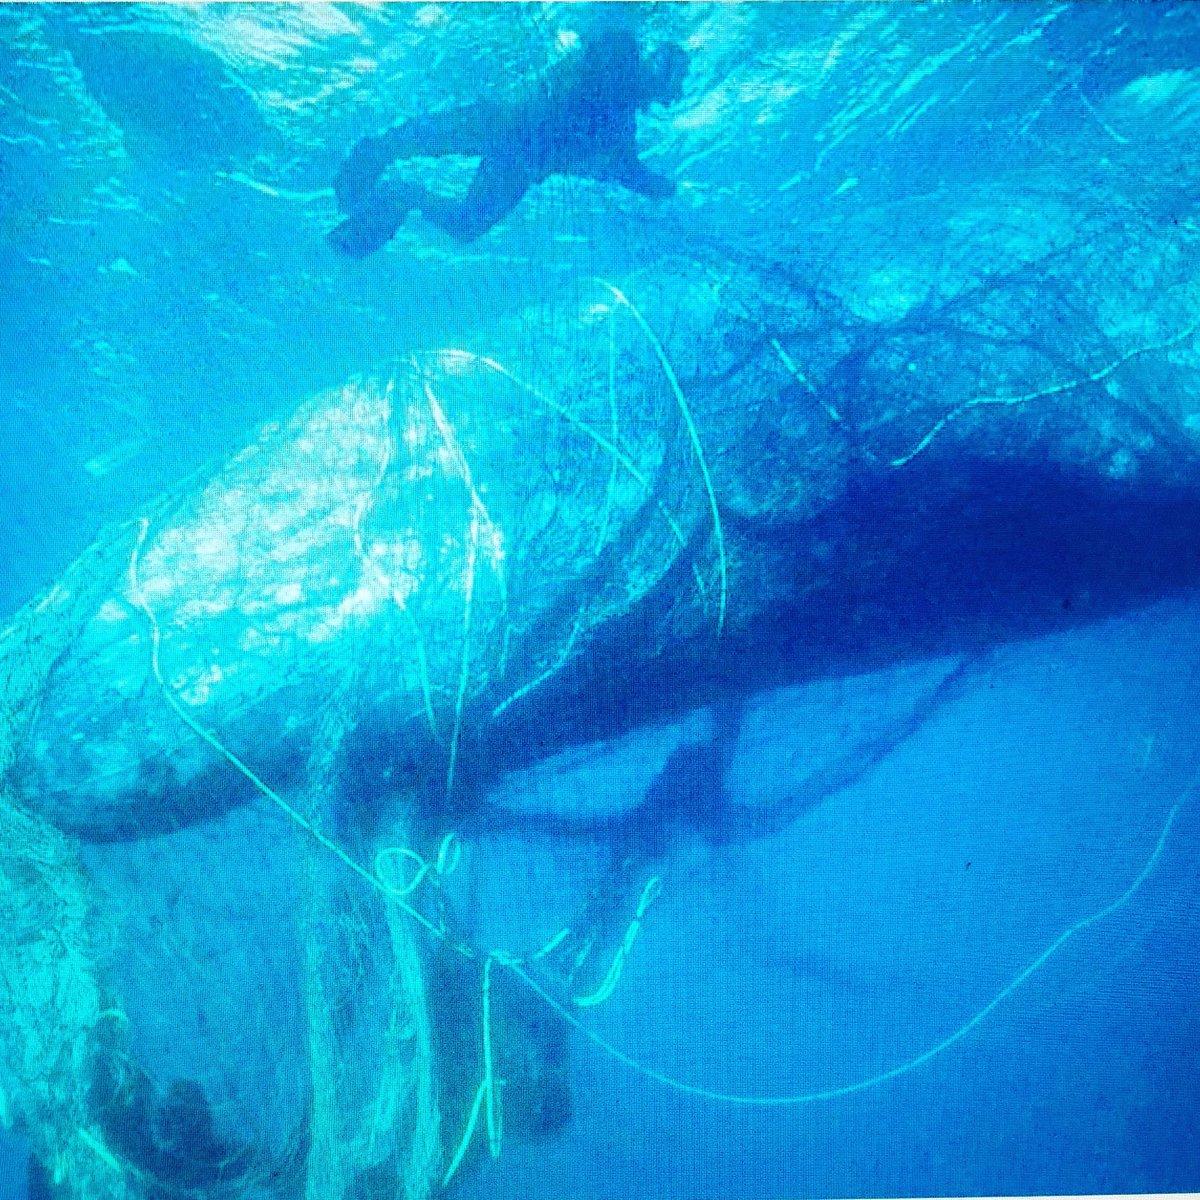 Check out Hayden'https://t.co/PHwdpGxUTu #oceansmatter #haydenpanettiere https://t.co/ERRqTza1tn